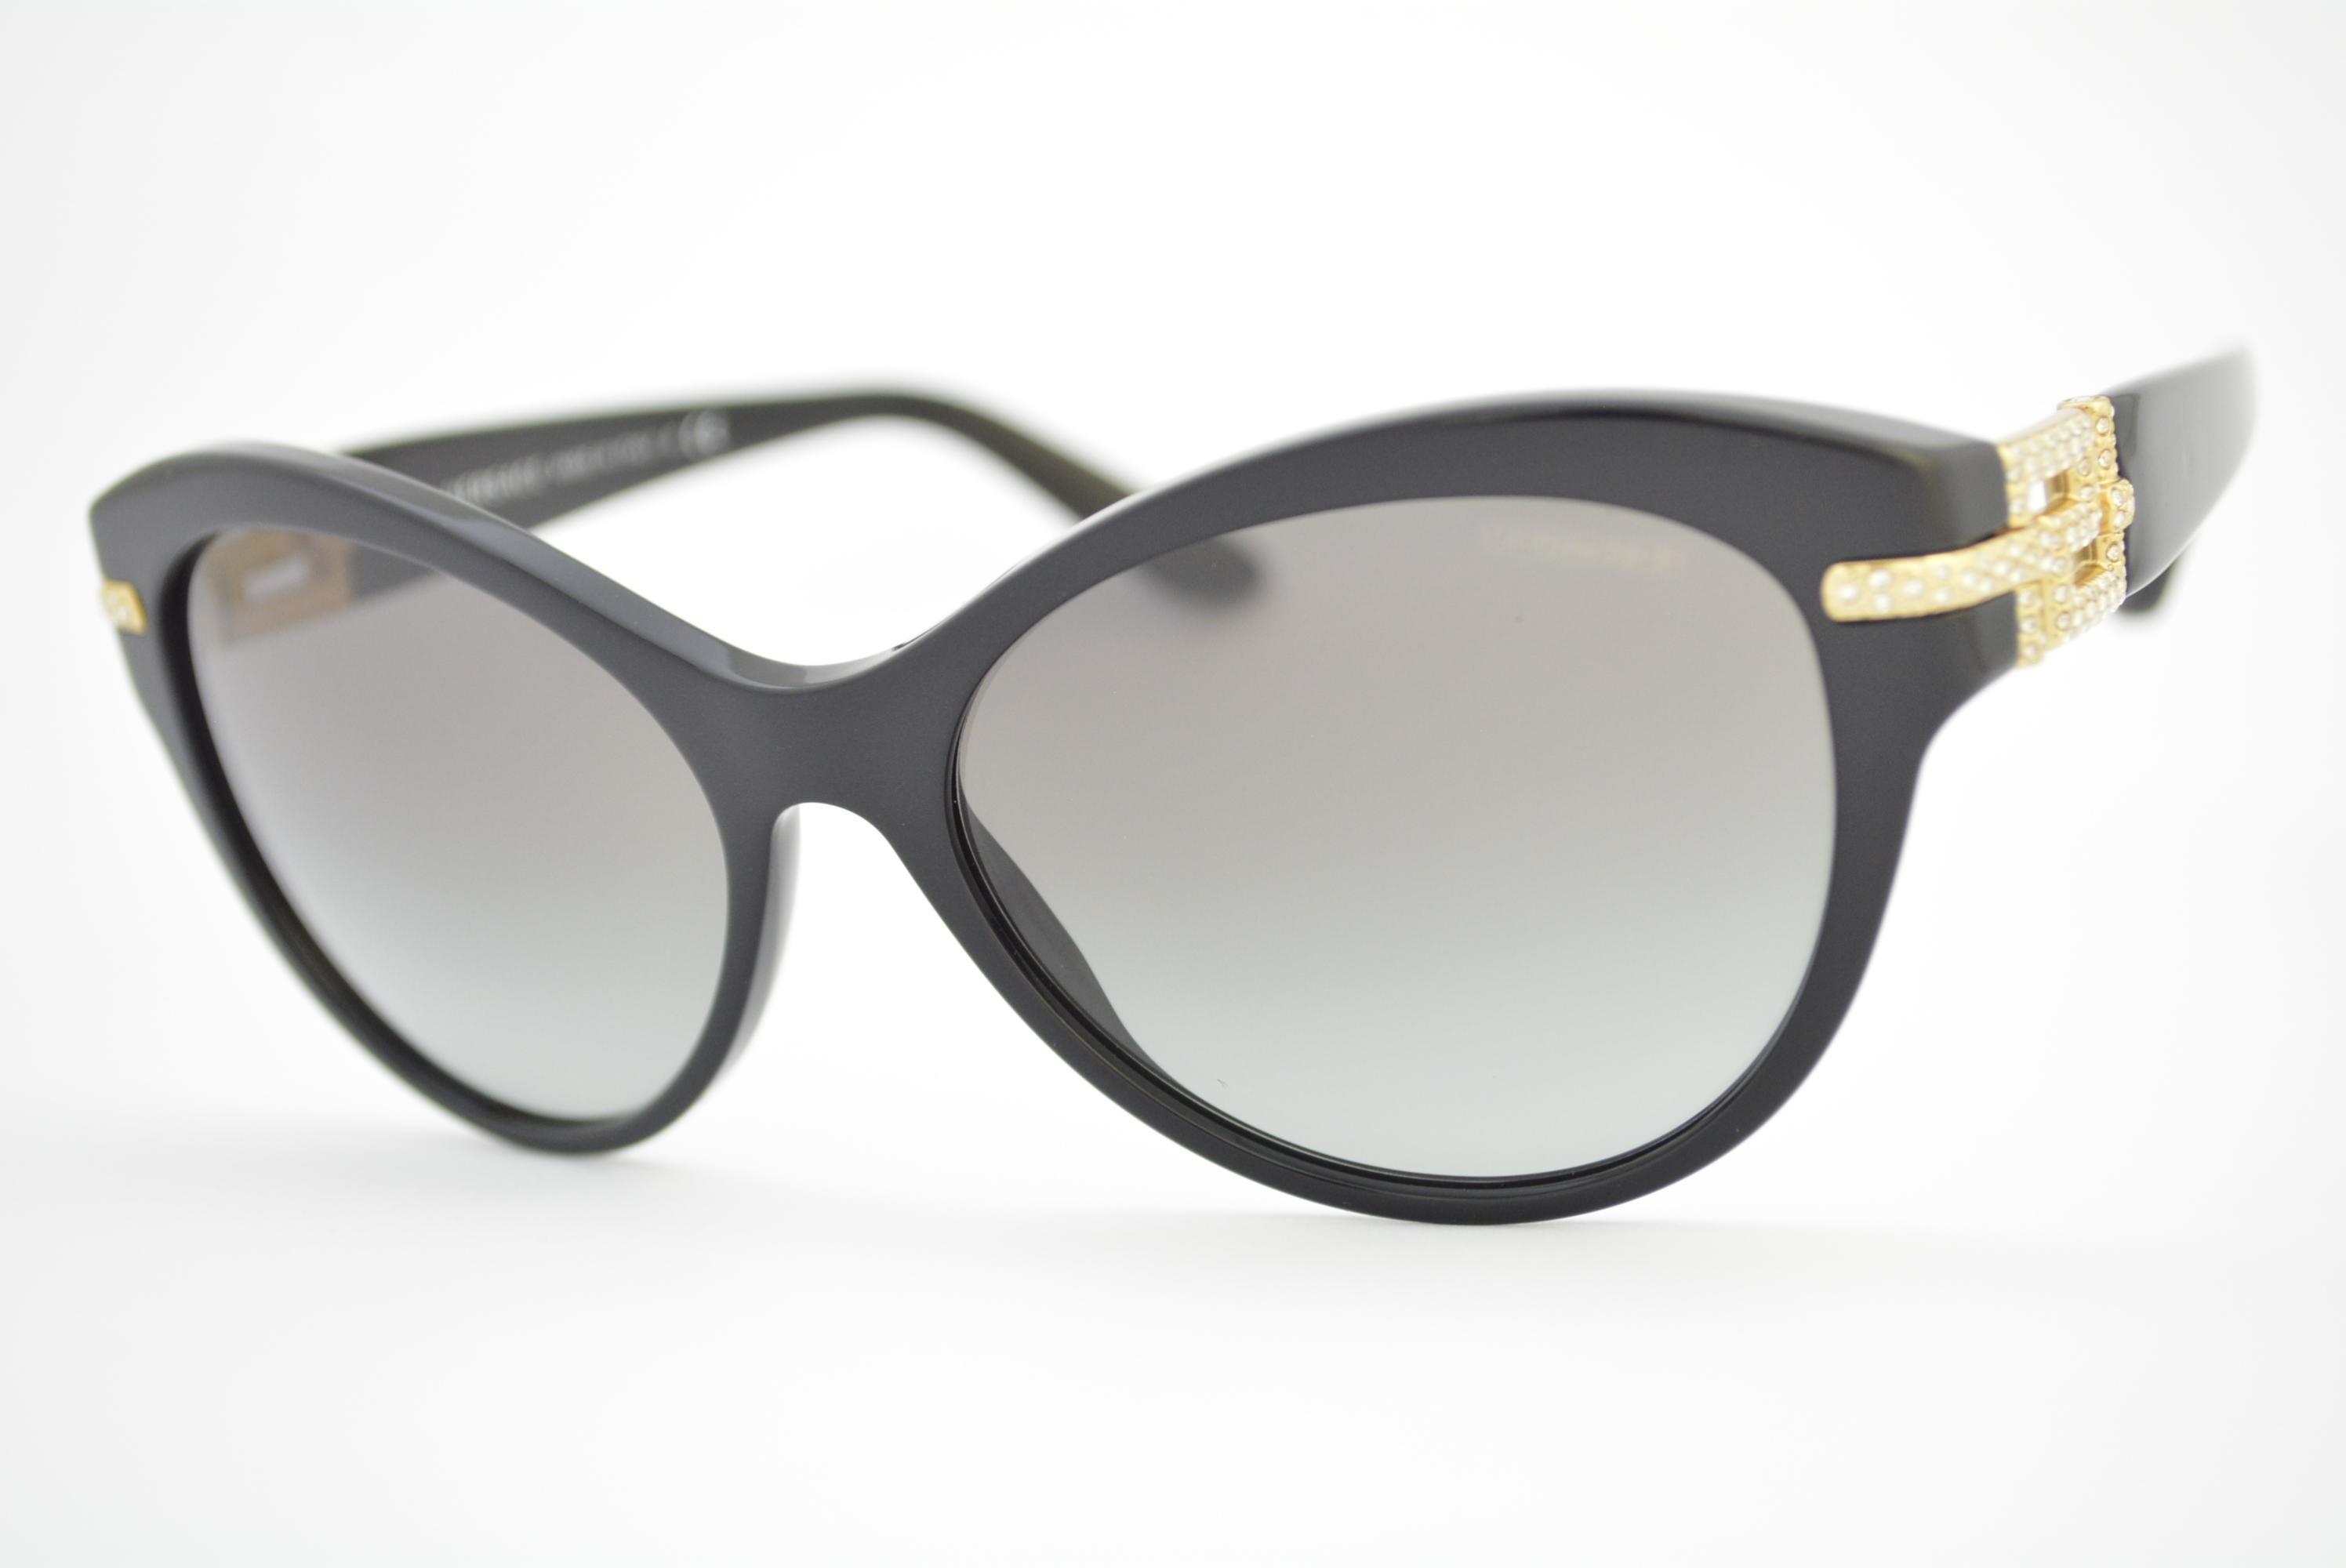 5dc6711b60a2b óculos de sol Versace mod 4283-B GB1 11 Ótica Cardoso